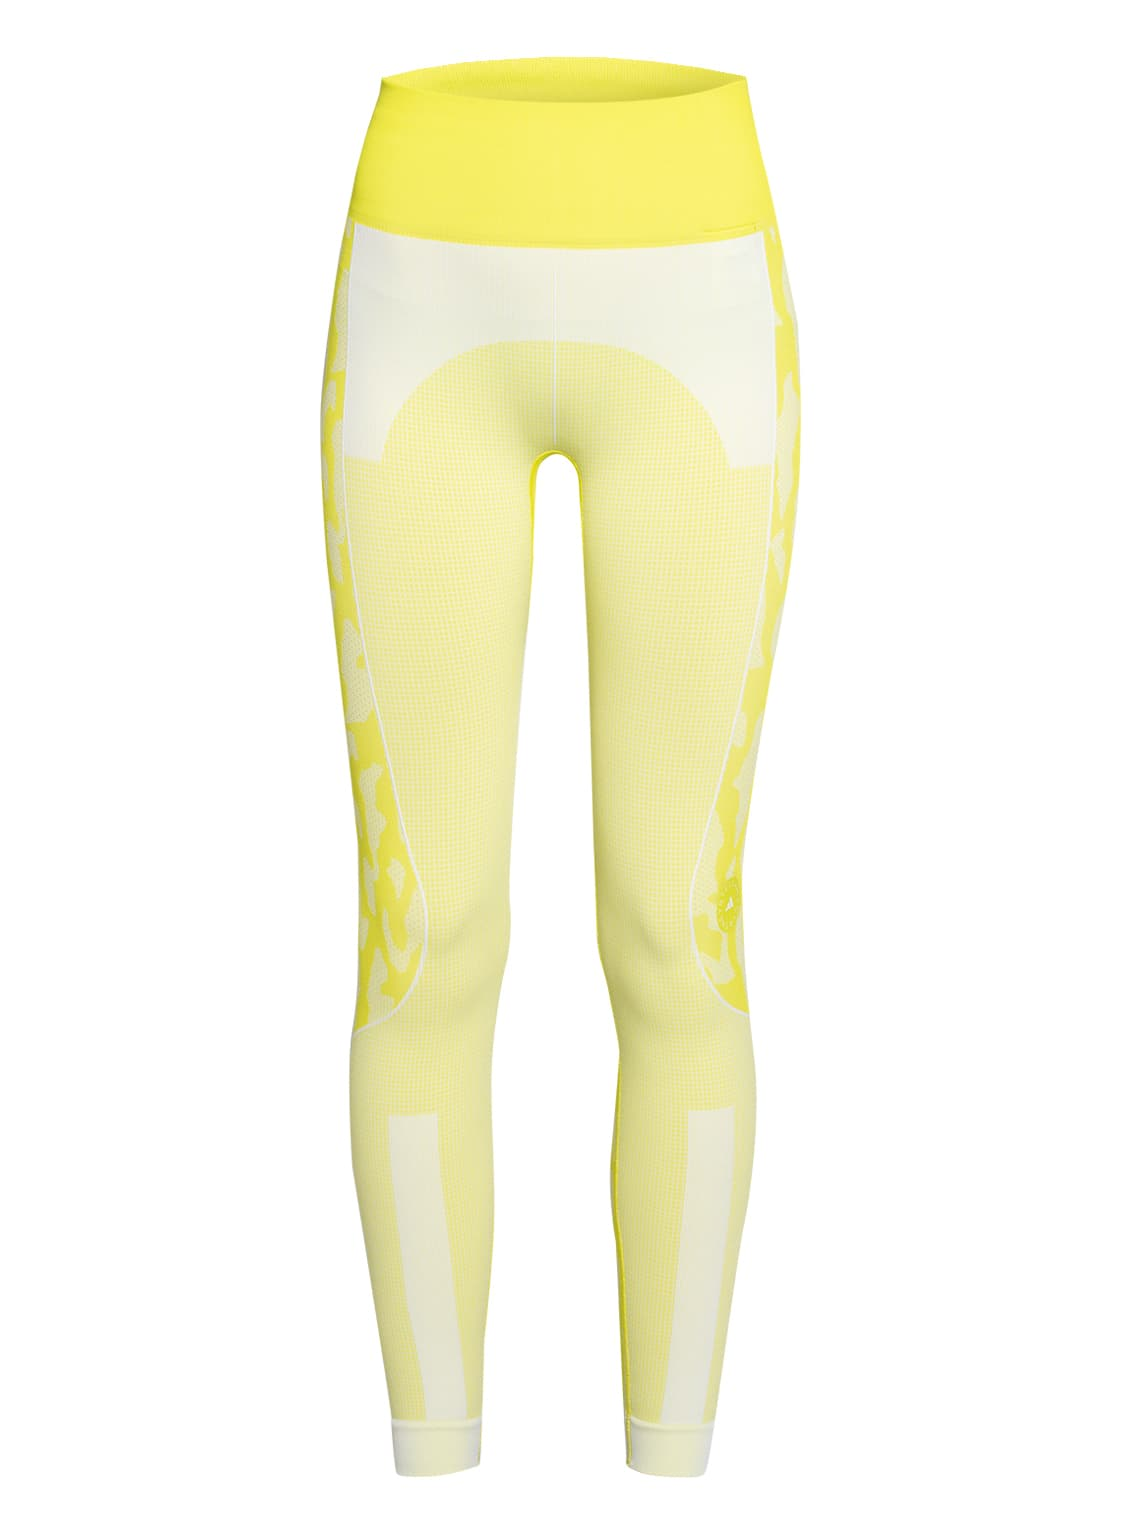 Image of Adidas By Stella Mccartney 7/8-Tights Truepurpose gelb